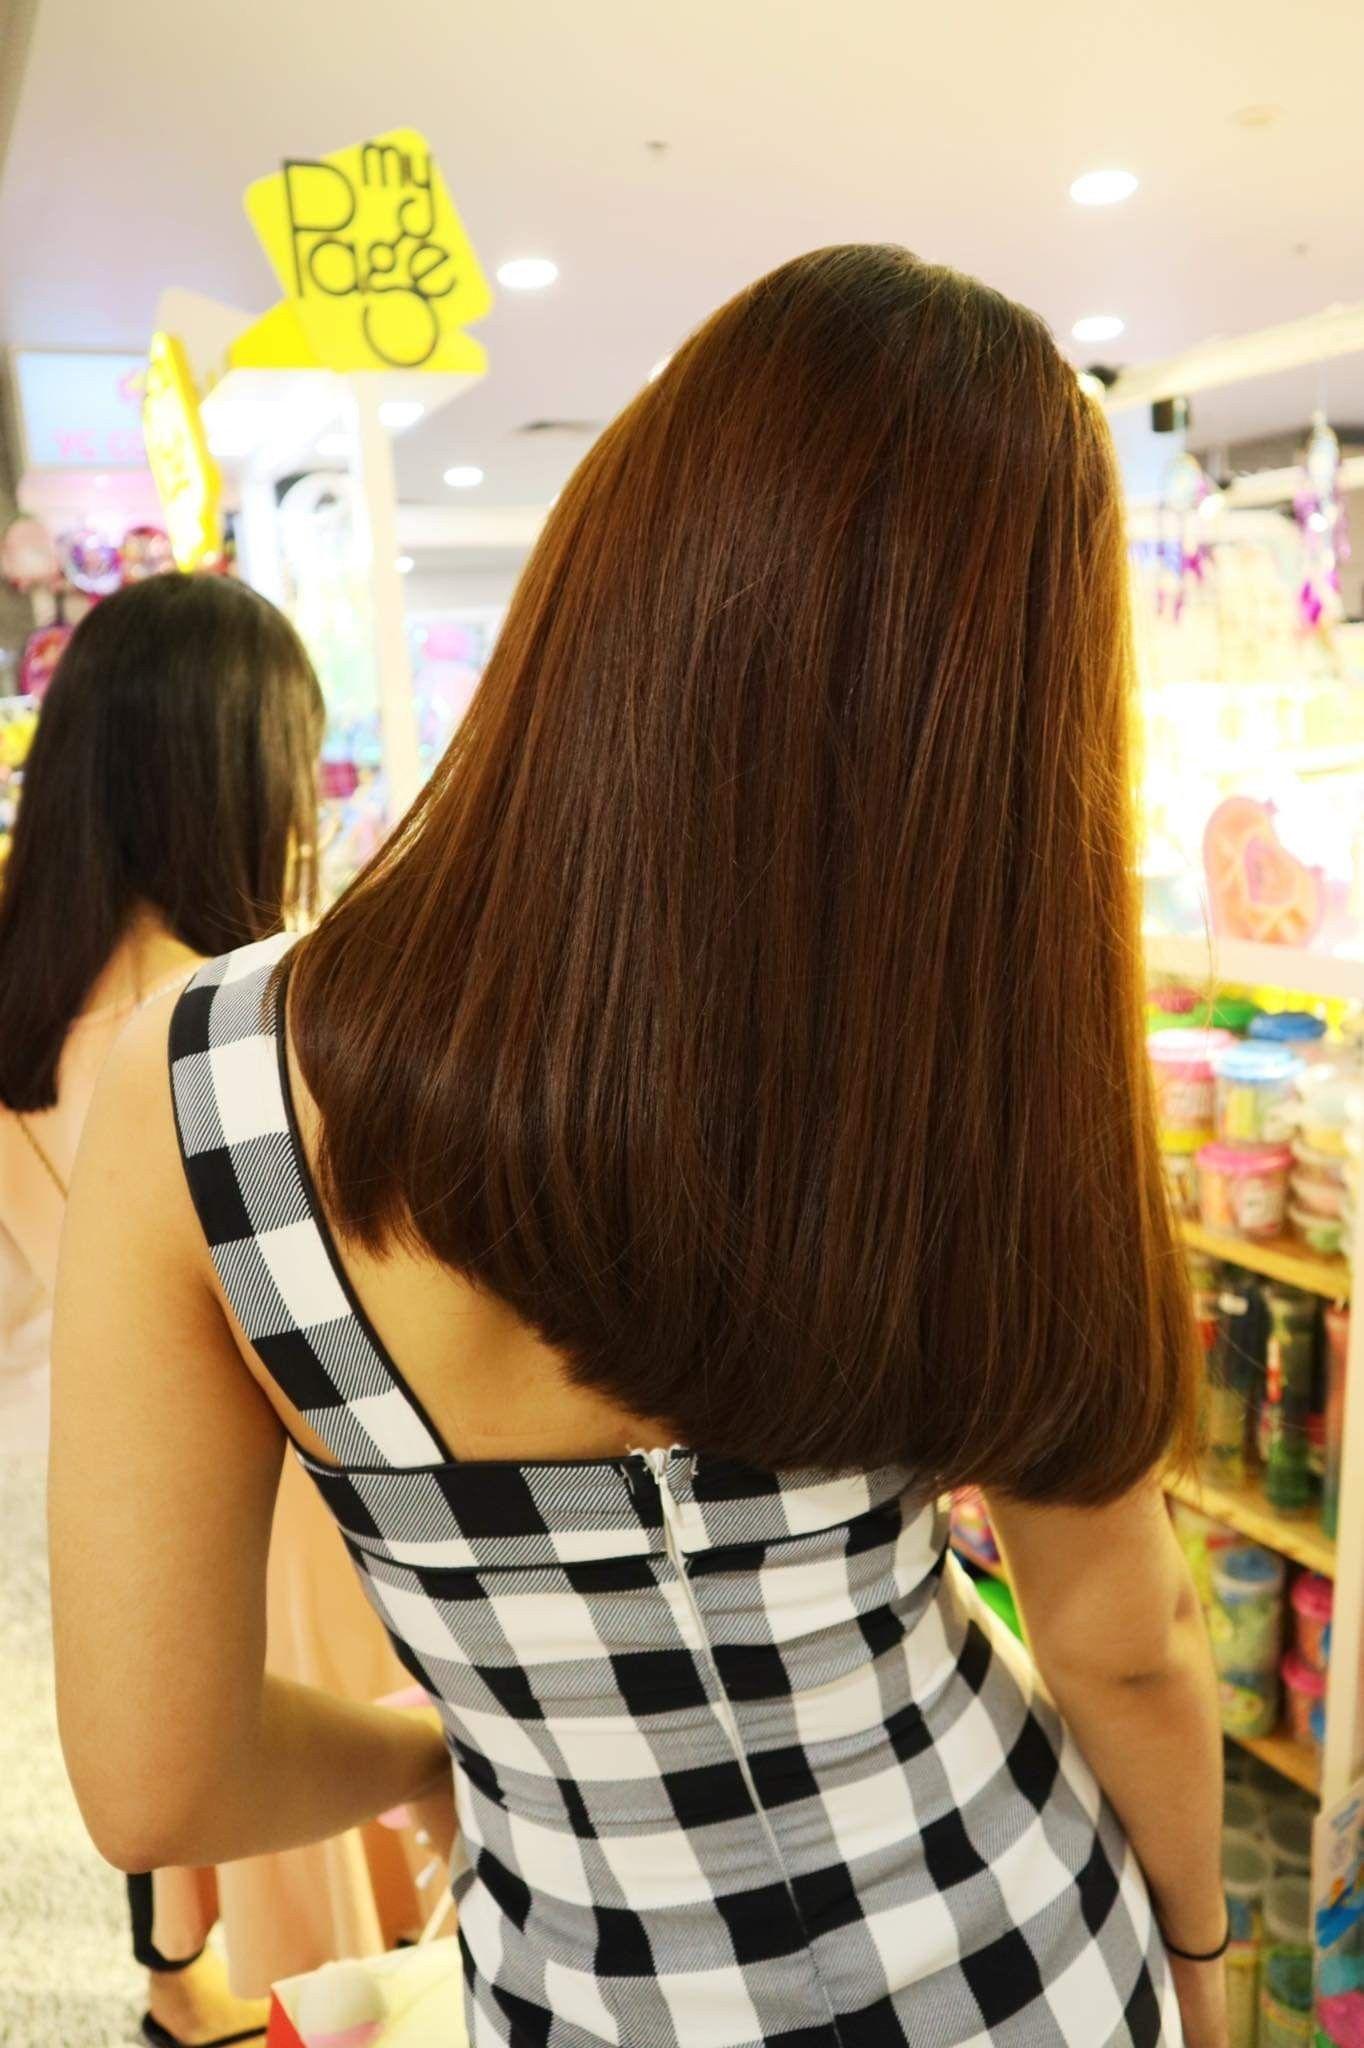 Pin by Myanmar Celes Fun Group on Phone Thiri Kyaw  Beauty, Hair